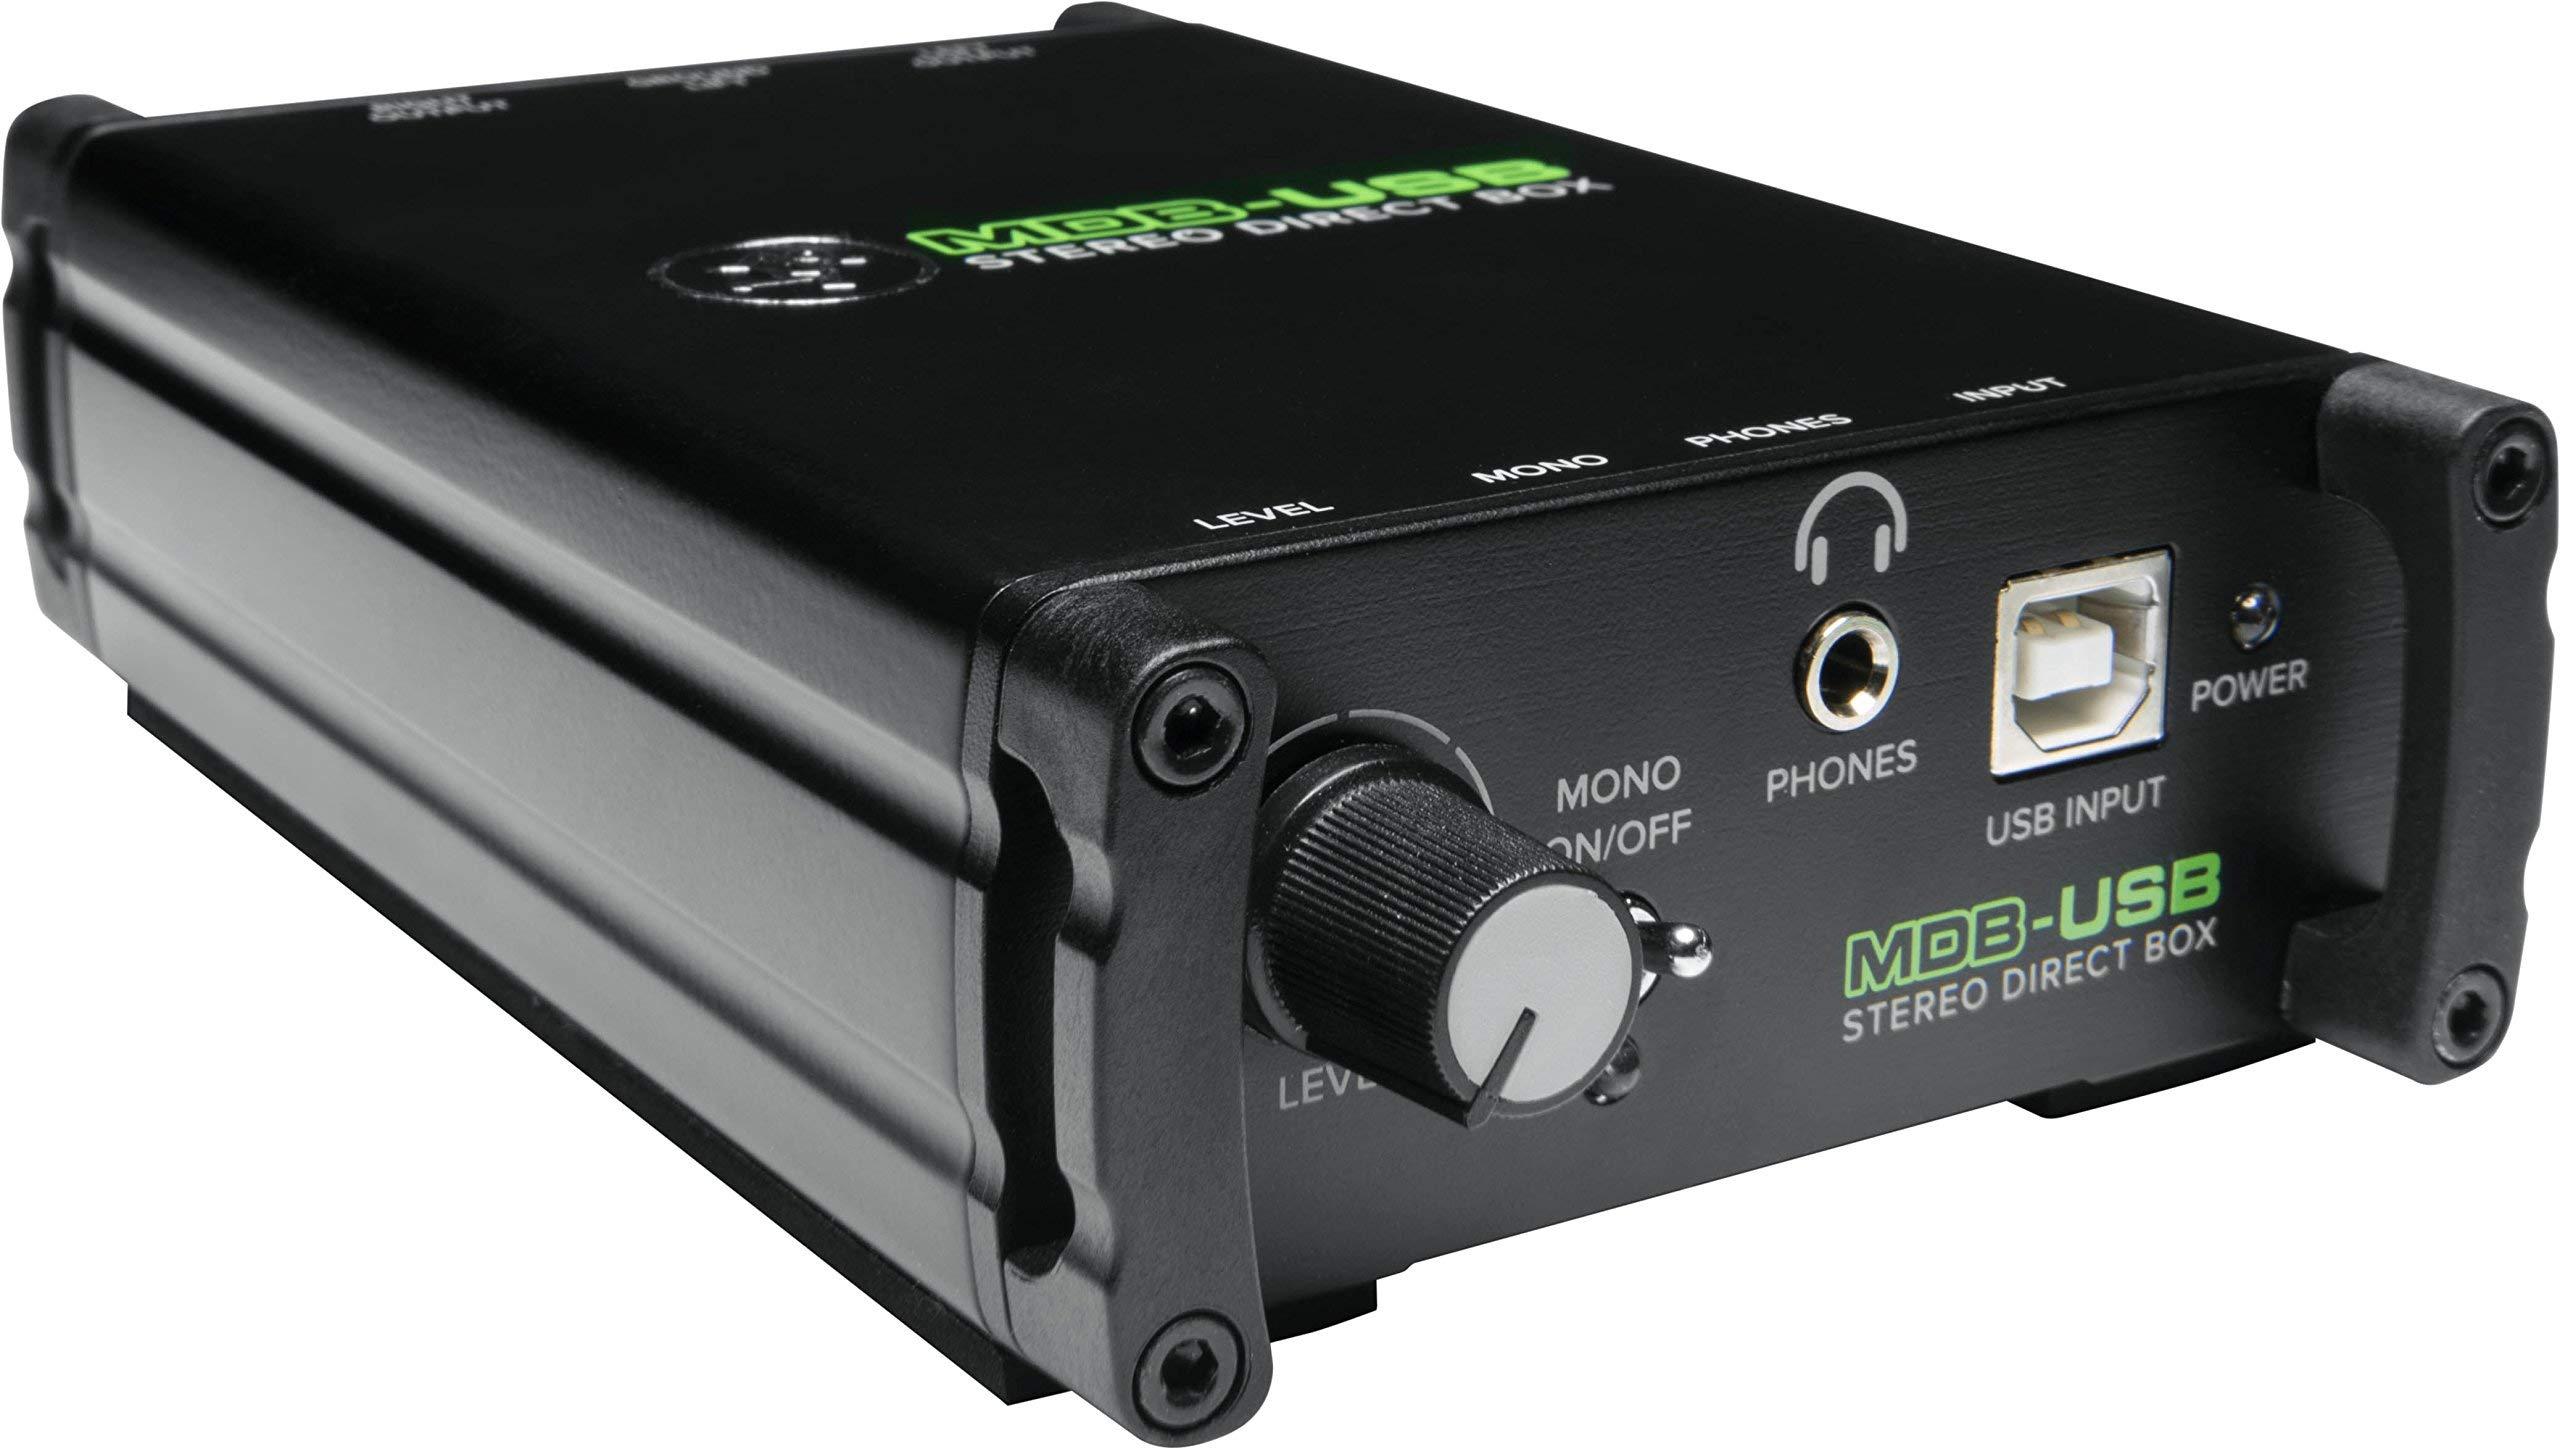 Mackie Signal Direct Box MDB-USB (Renewed)